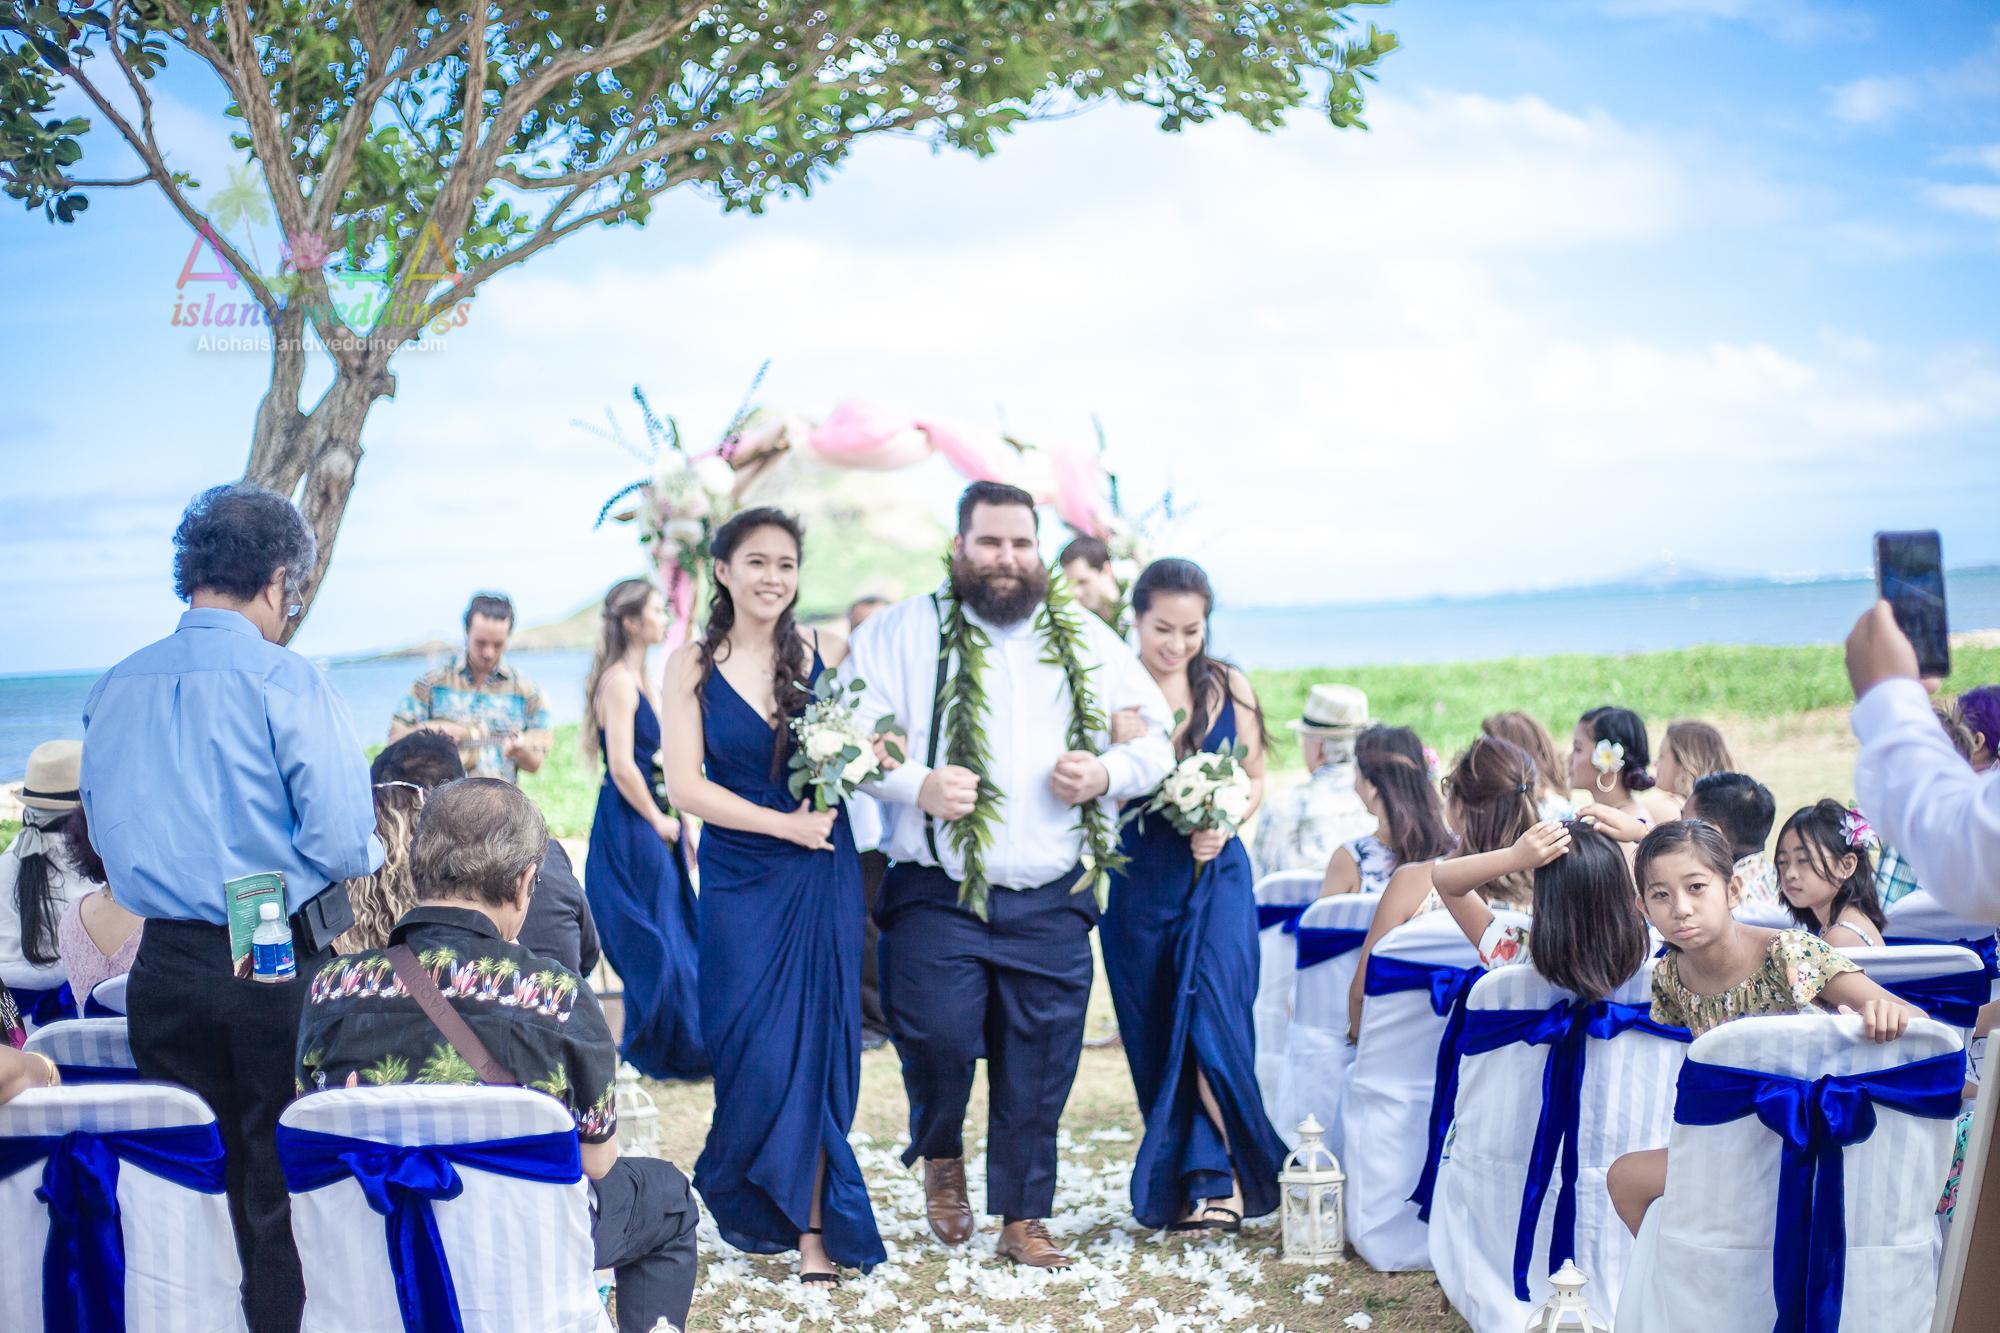 Hawaii weddings and events, Kualoa-32